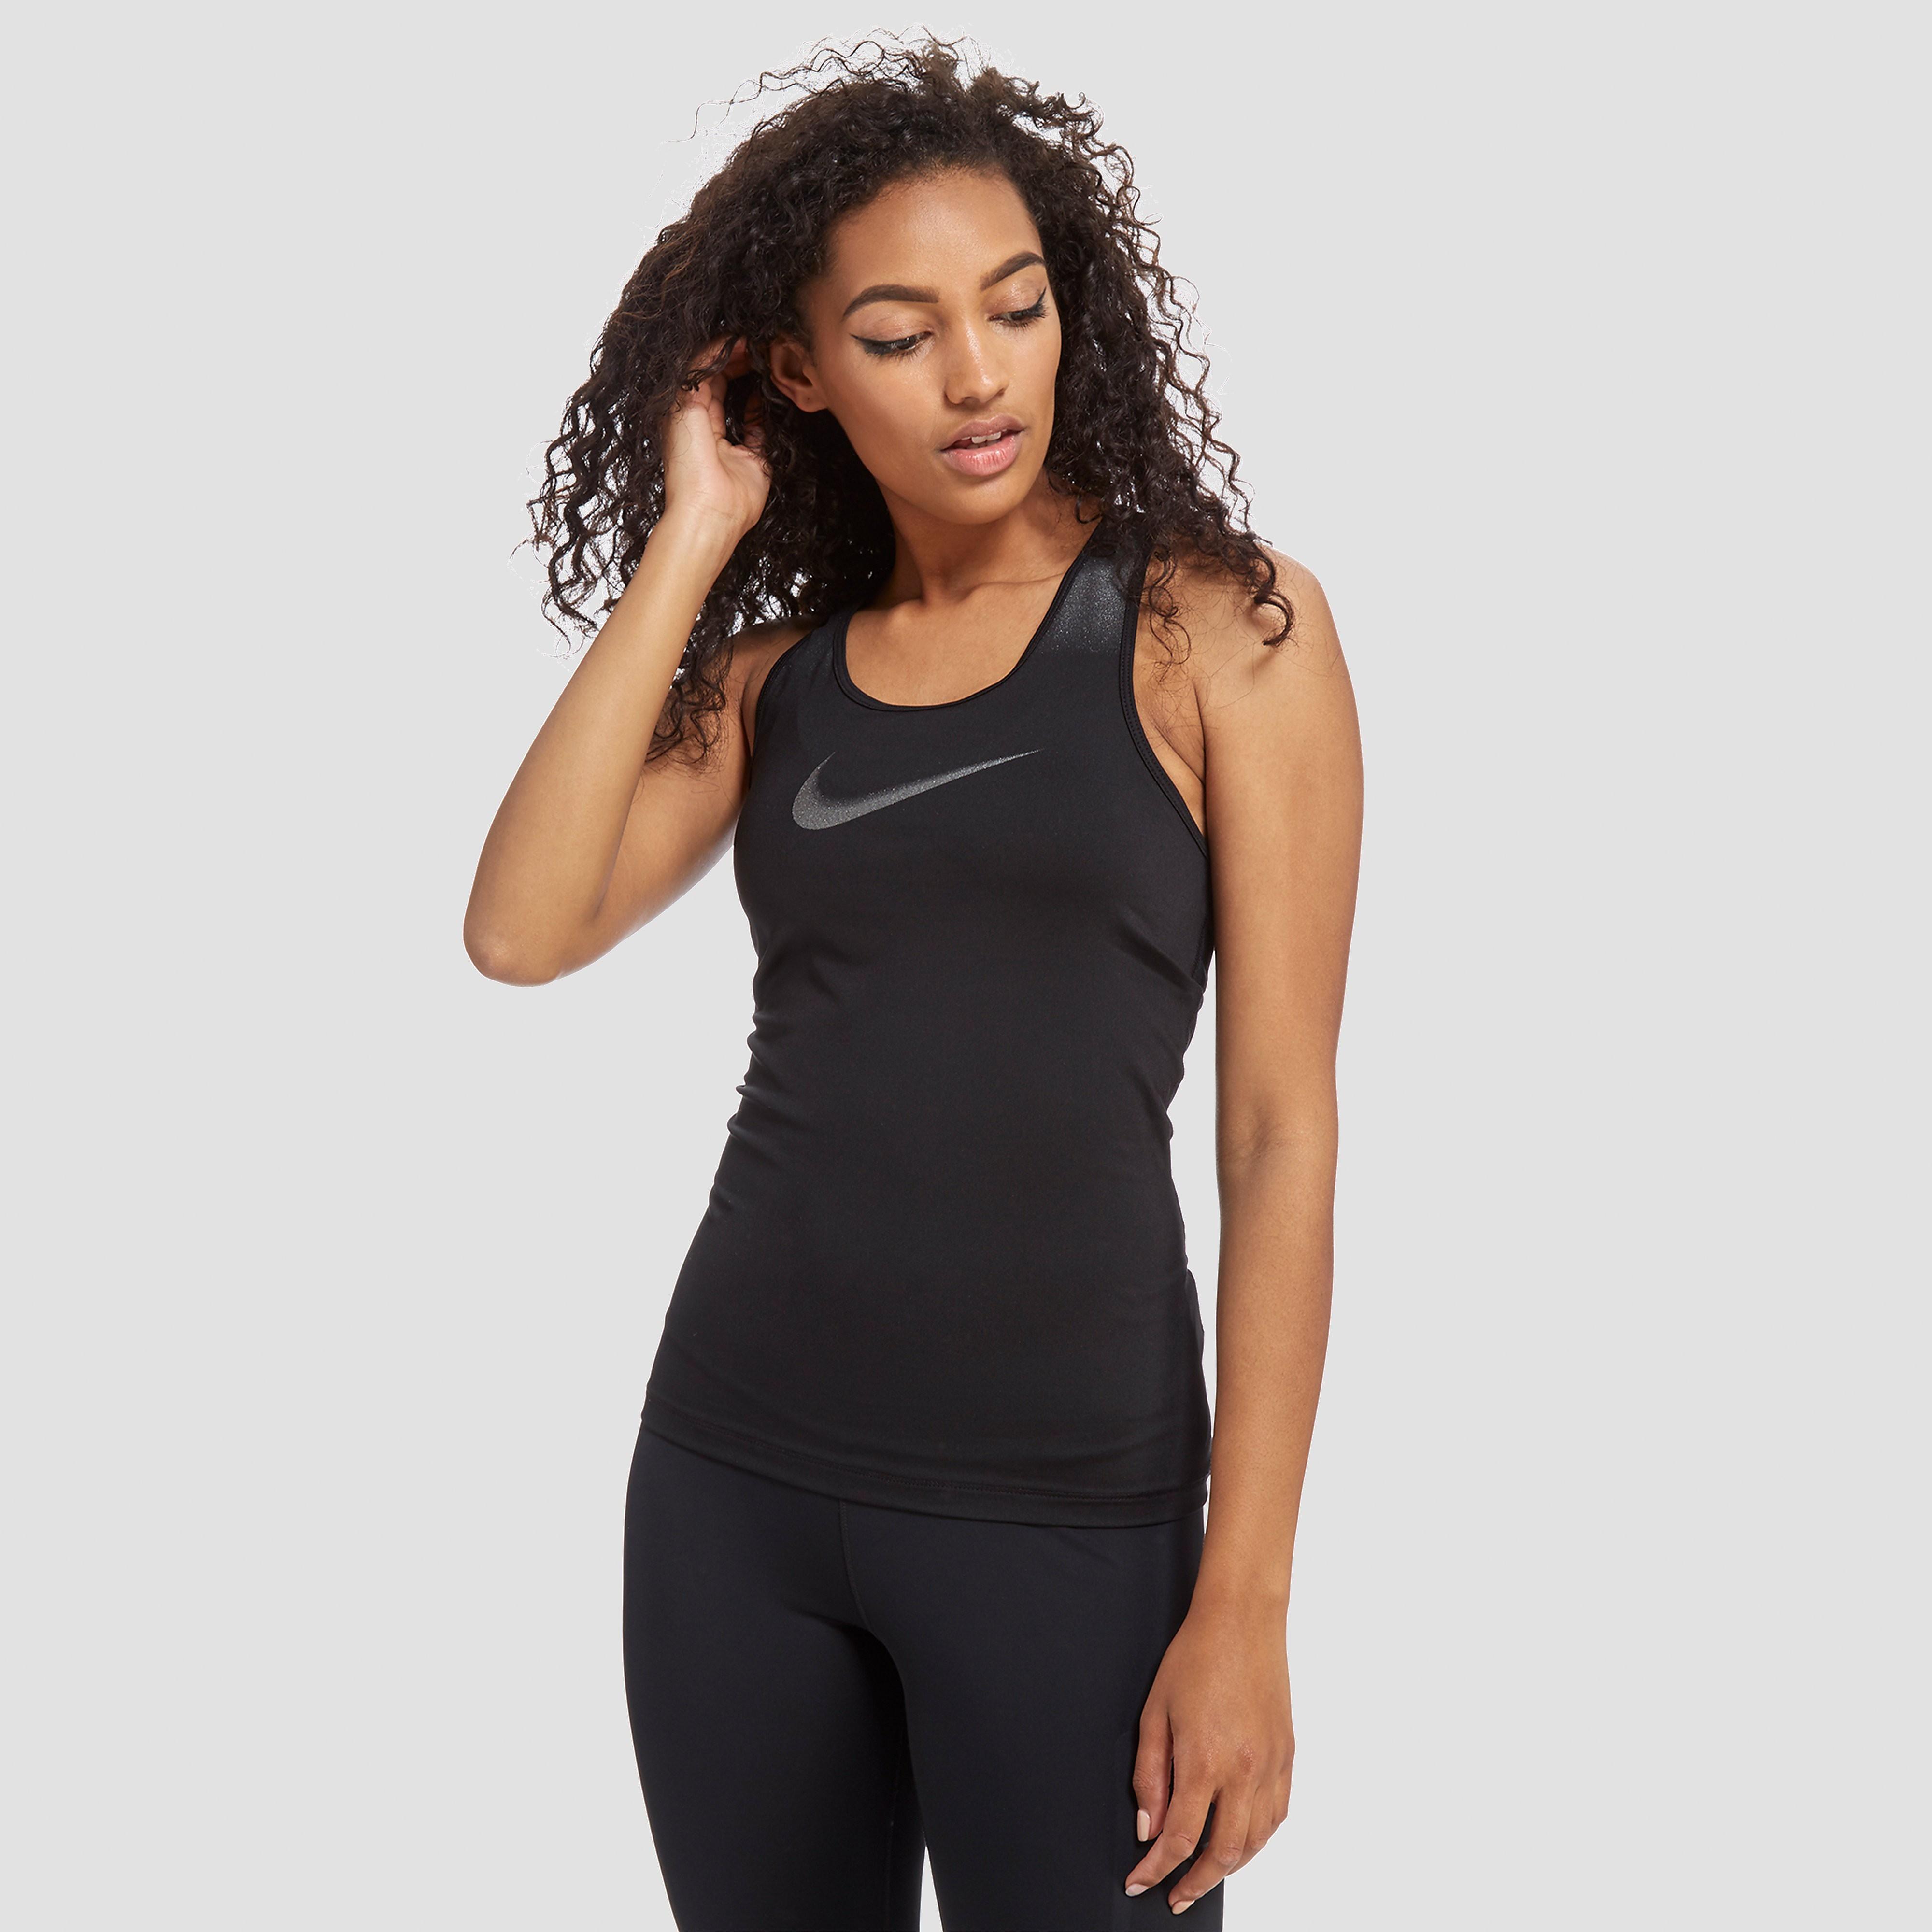 Nike Pro Sparkle Women's Tank Top